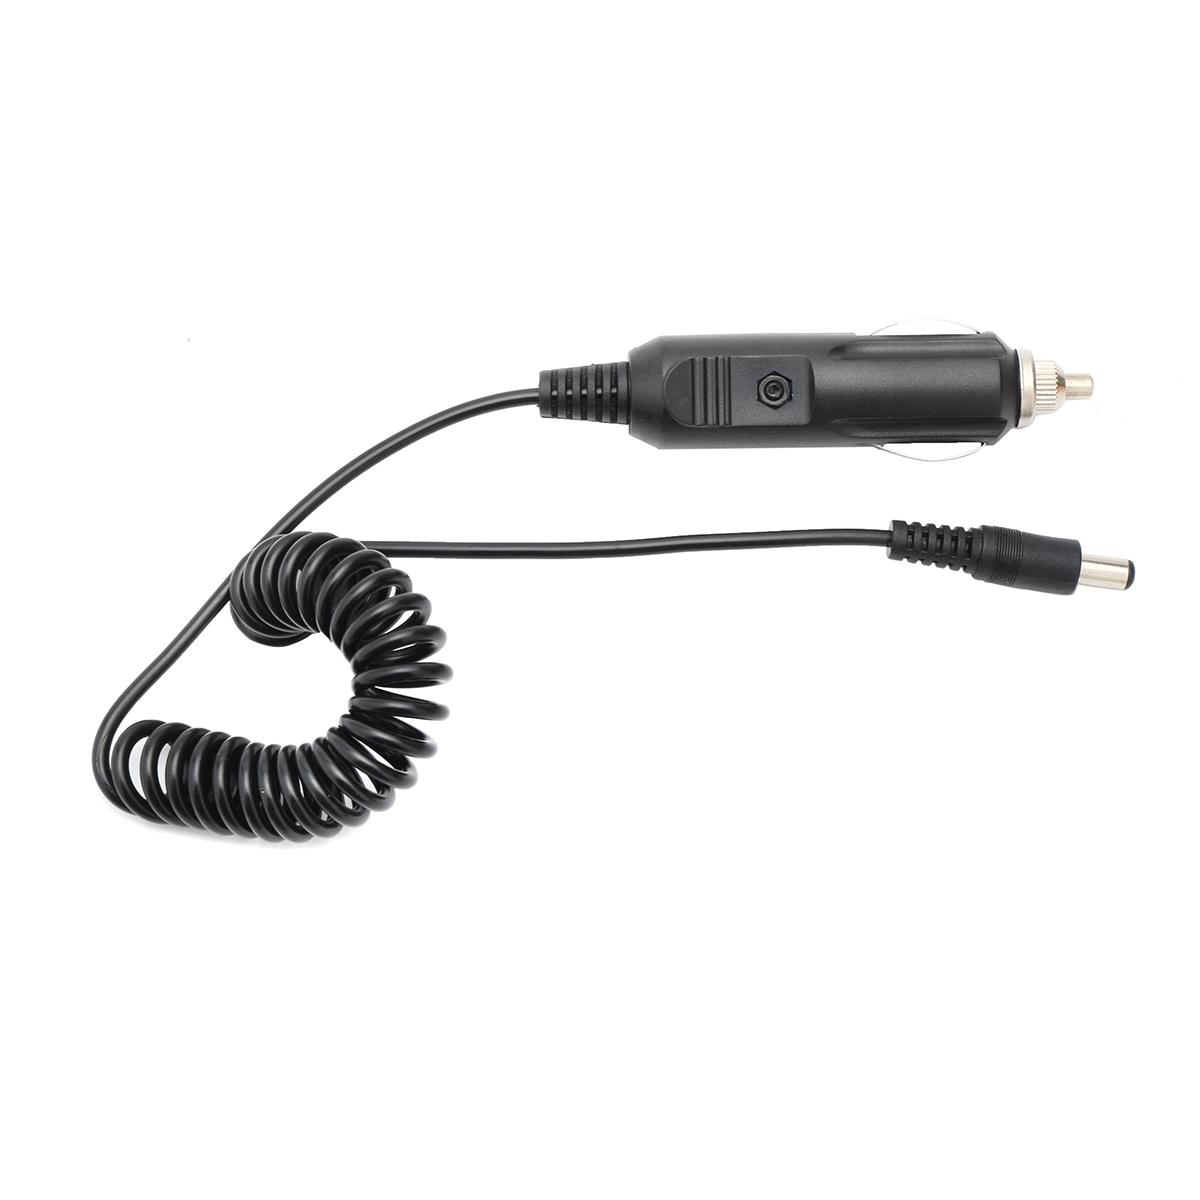 12V Car Cigarette Lighter Socket Power Supply Charger